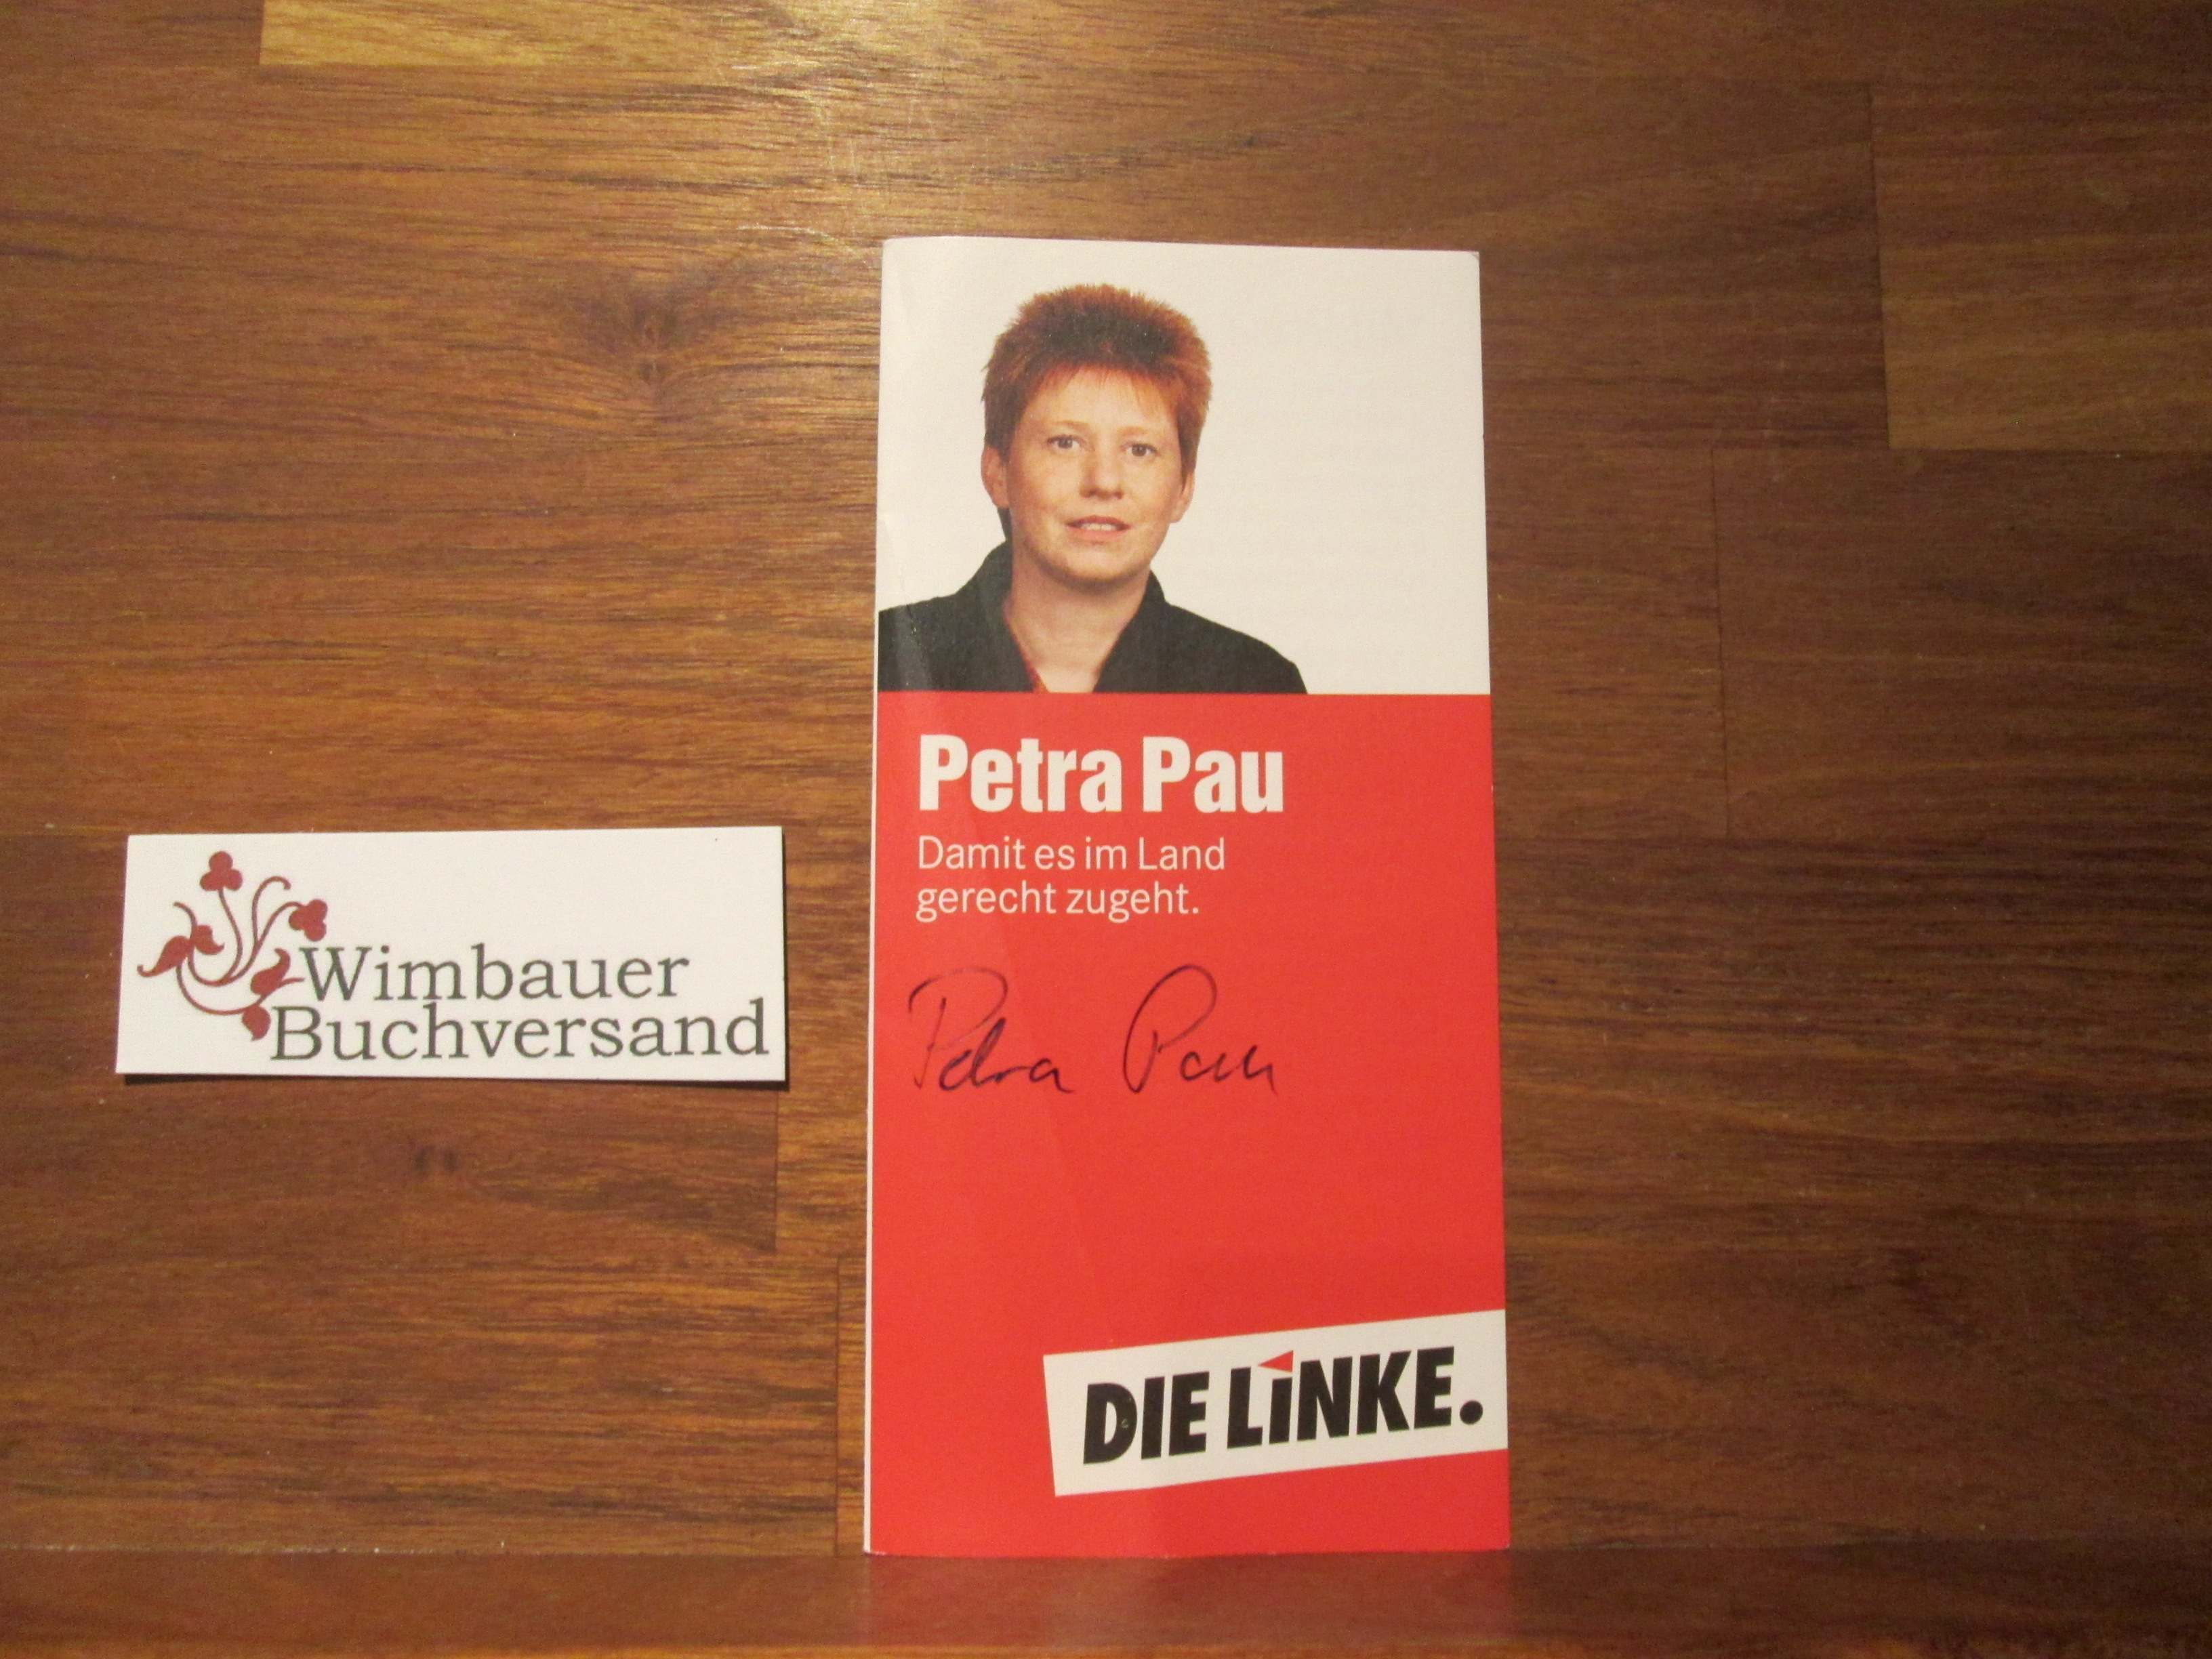 Signierter Prospekt Petra Pau Vizepräsidentin Deutscher Bundestag Autogramm Autograph signiert signed signee